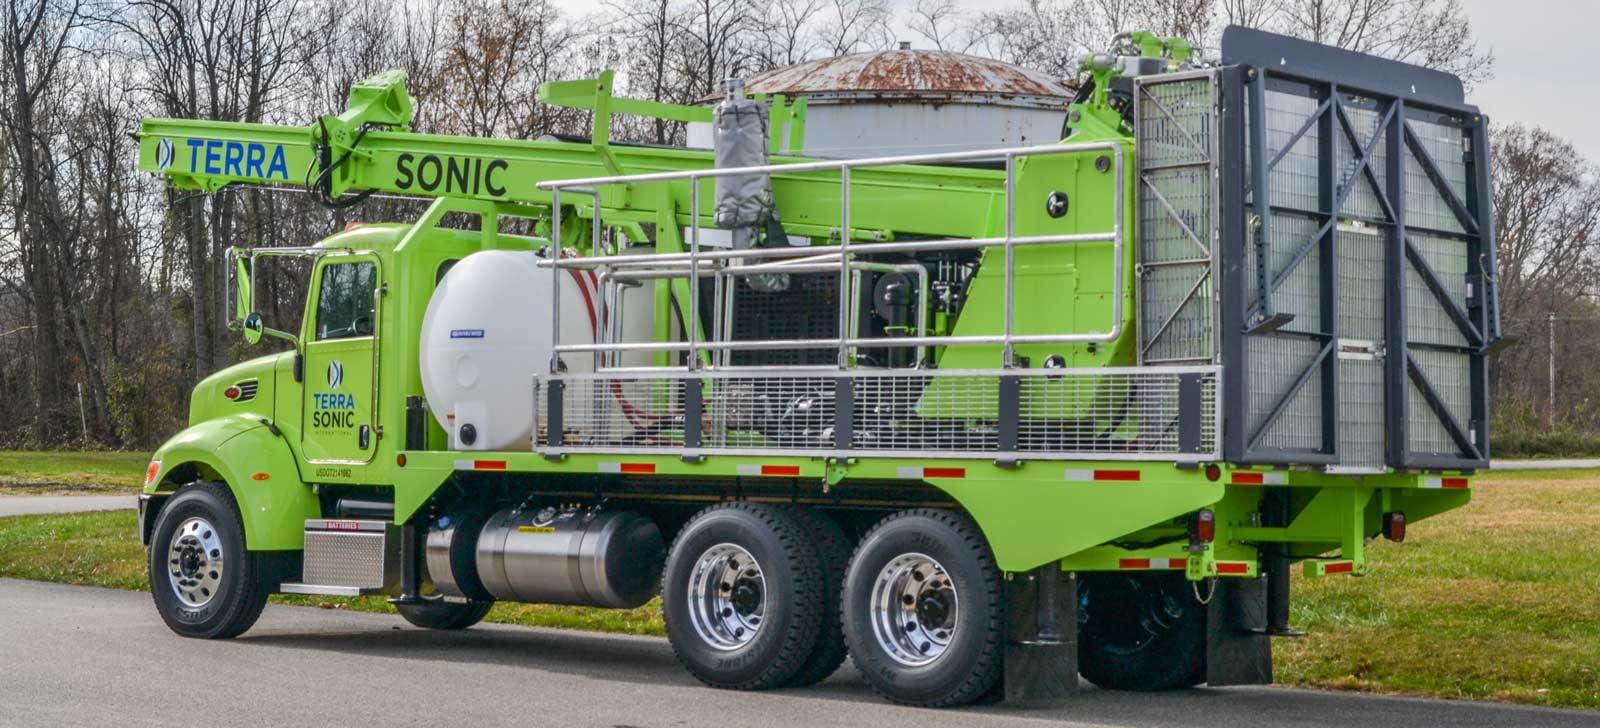 TSi Sonic Drill Rig Truck - rear quarter view